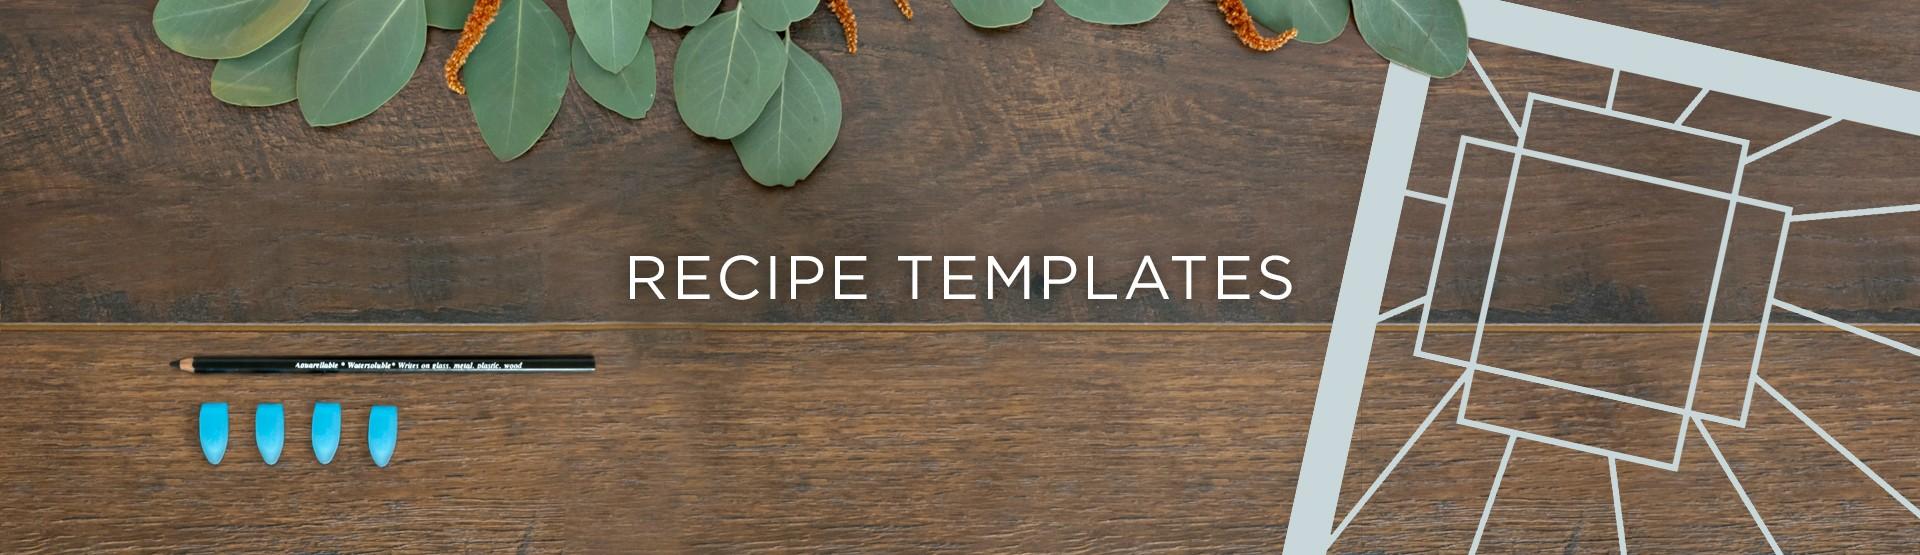 Recipe Templates